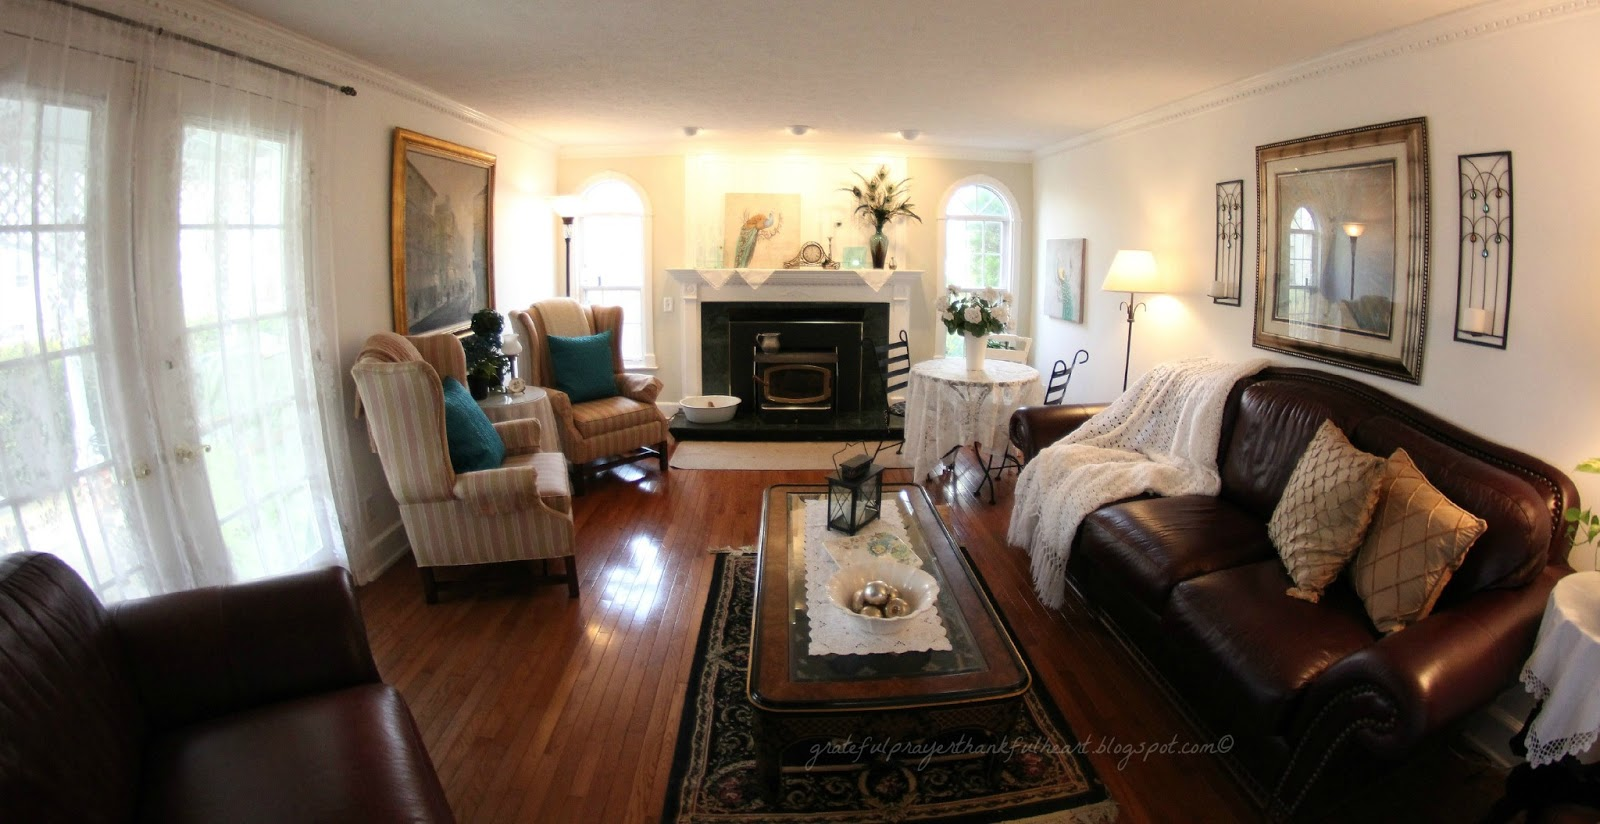 http://4.bp.blogspot.com/-5pPQTfW2q7A/UPAA_-IhLkI/AAAAAAAAQQc/ehVyLyOJr_k/s1600/family+room+fireplace+mantle+peacock+0421+wm.jpg